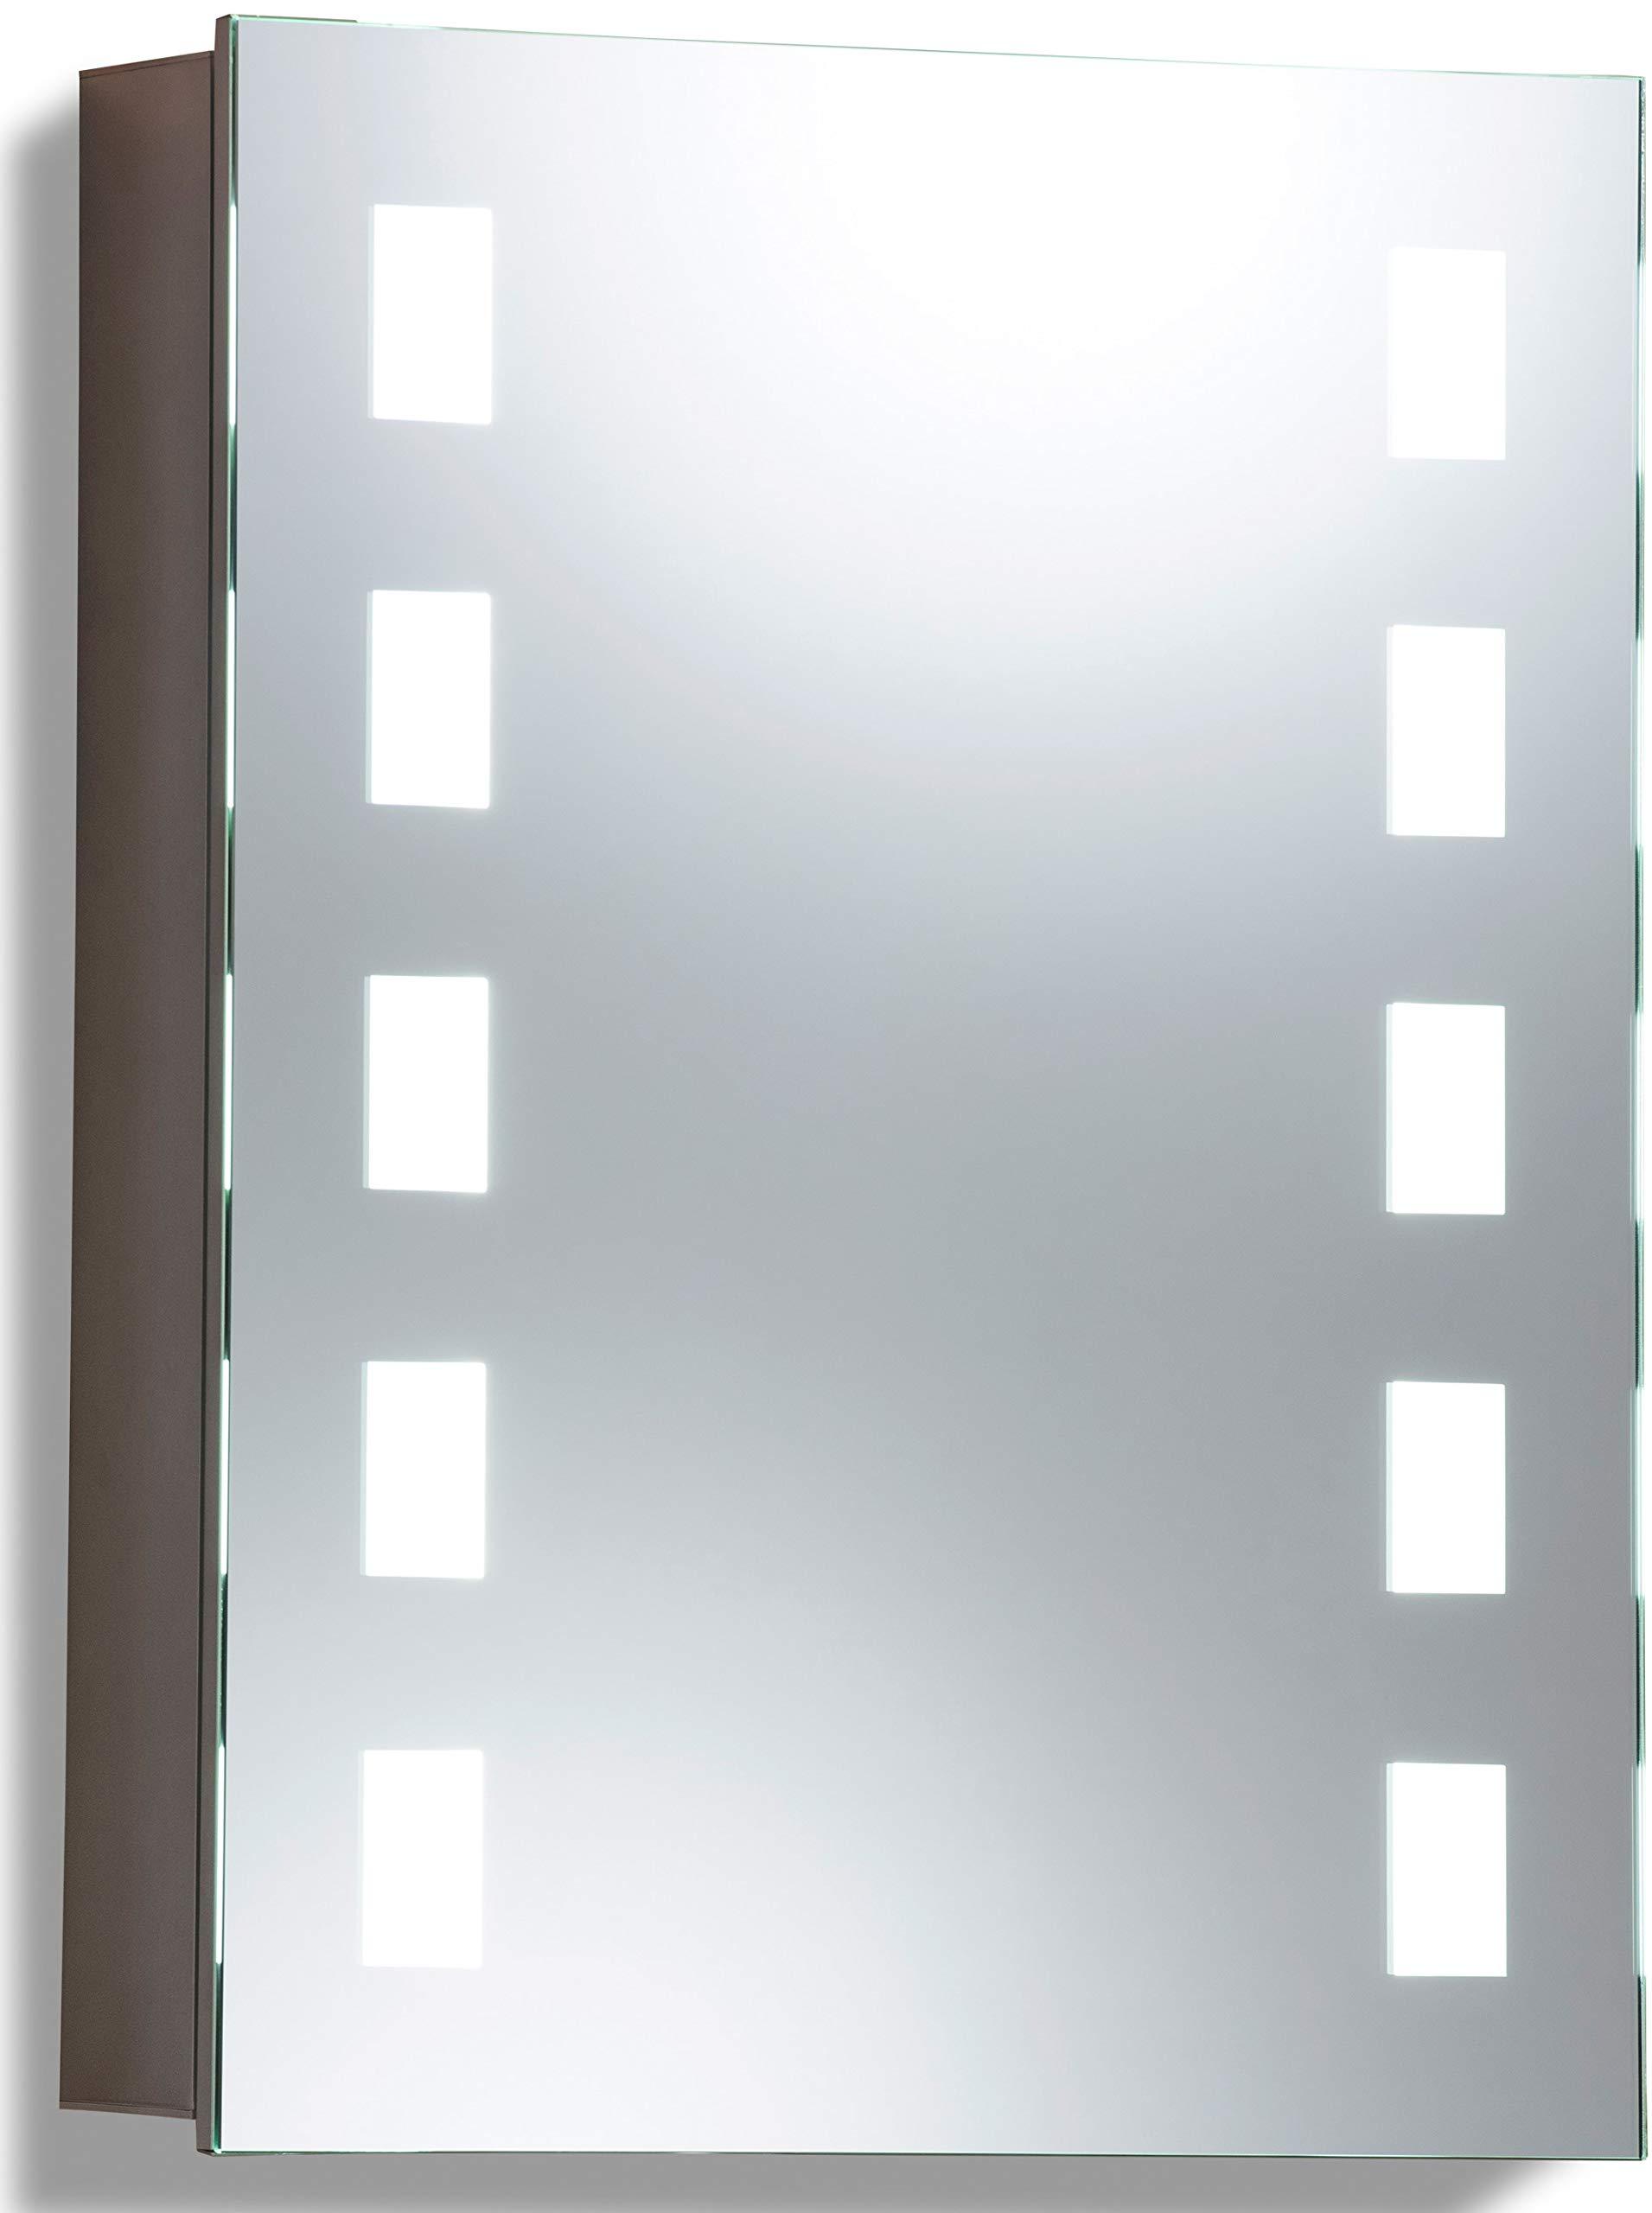 Demista Heated Mirror Demister Pad 230v Mirror Element 150mm X 970mm Buy Online In United Arab Emirates At Desertcart Ae Productid 156420912